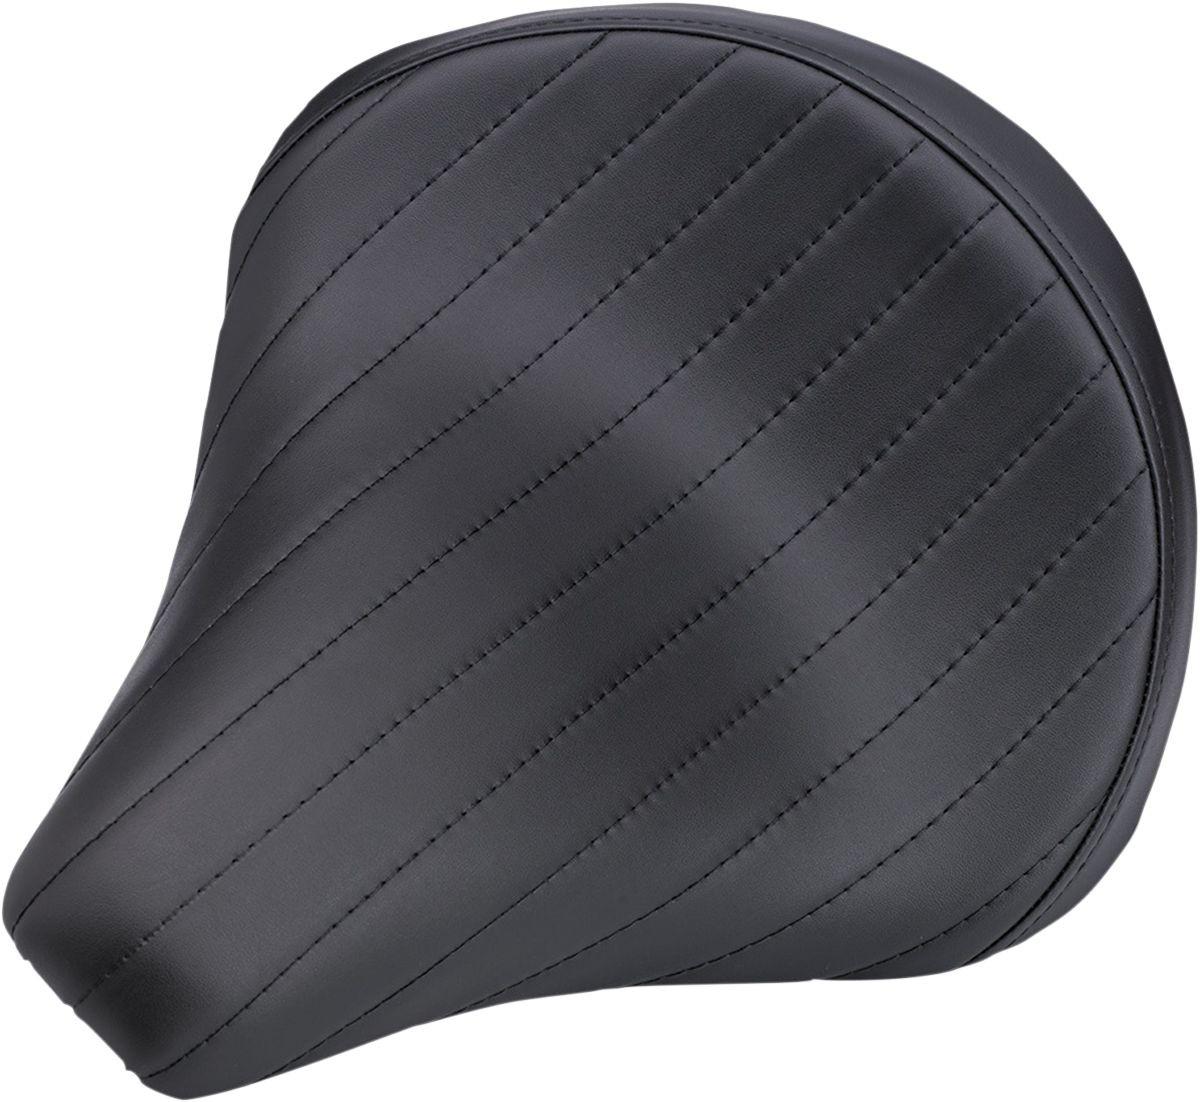 Biltwell Solo 2 Moto Motorcycle Motorbike Pan With Molded Polyurethane Foam Seat